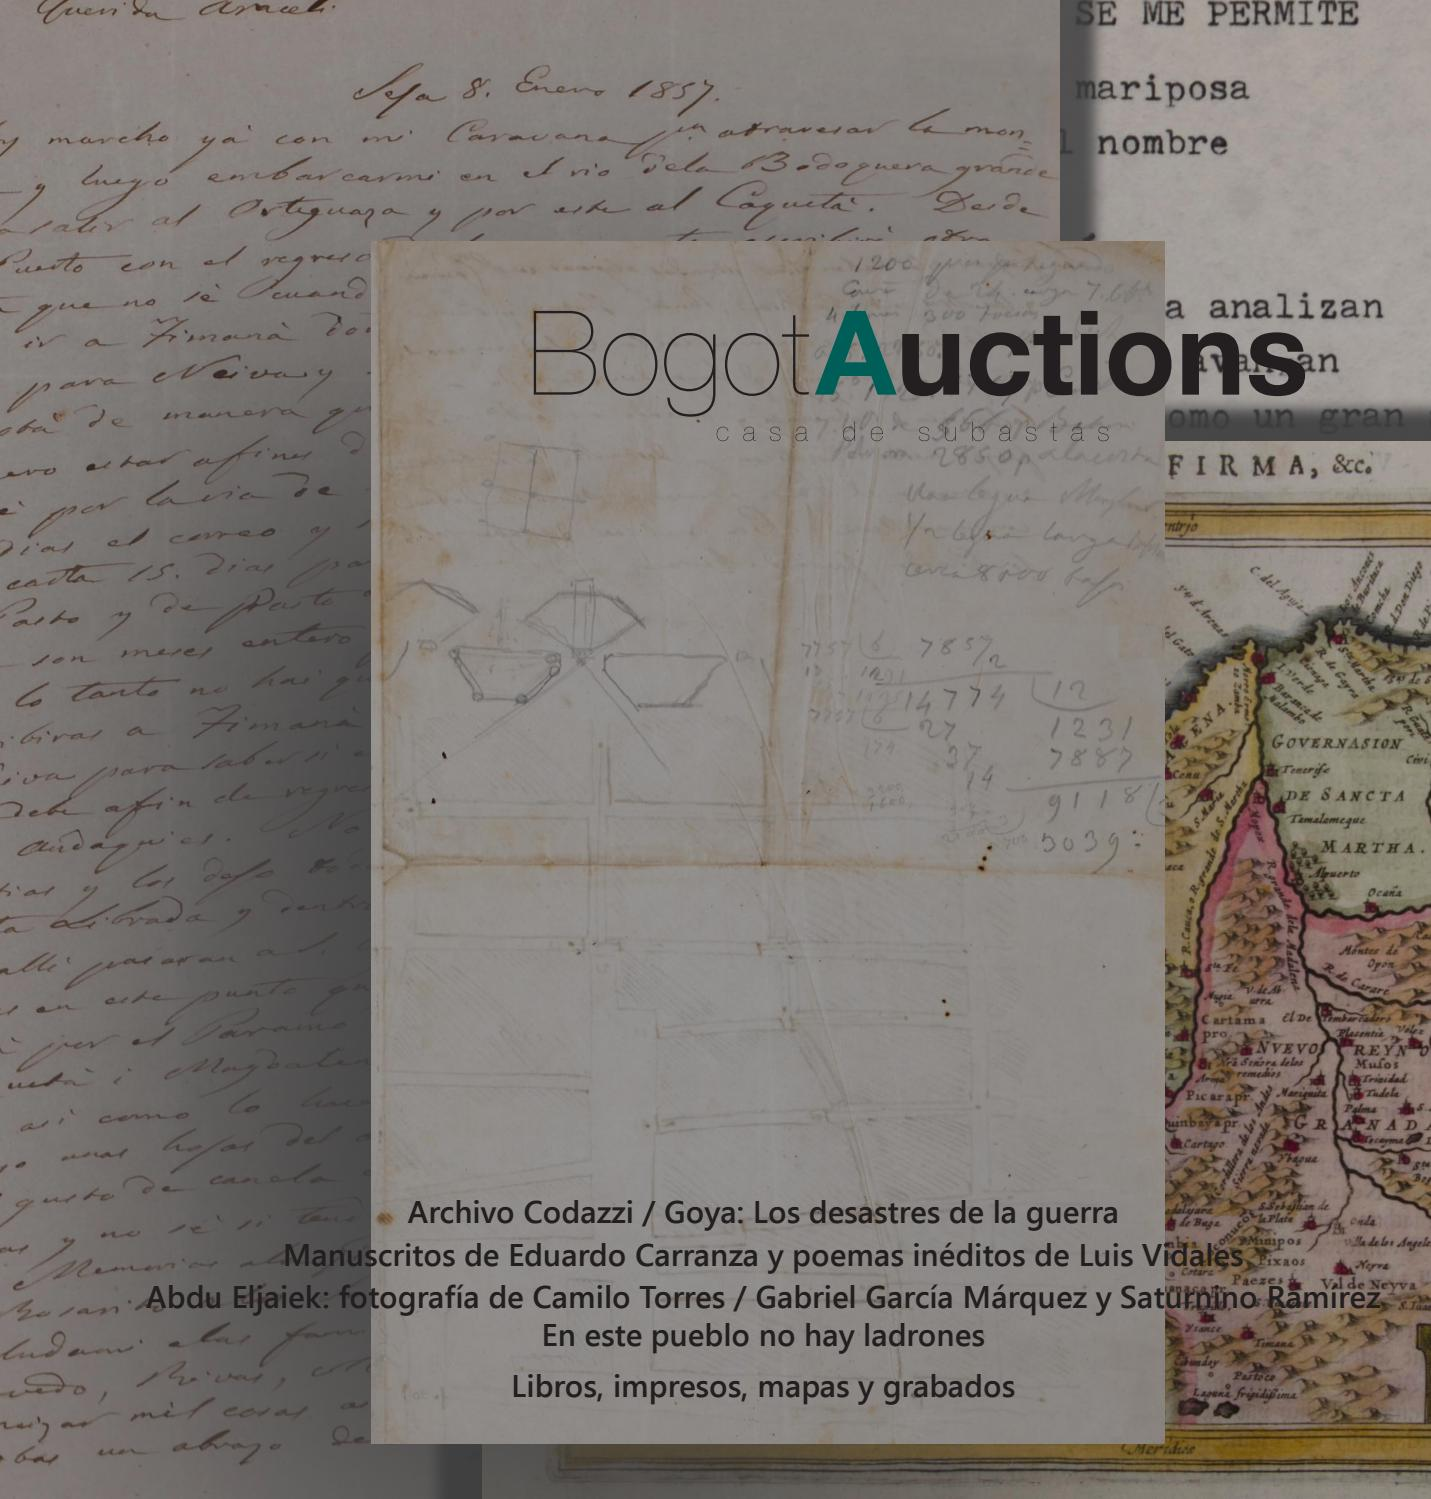 Catalogo Subasta 1711 by Bogota Auctions - issuu